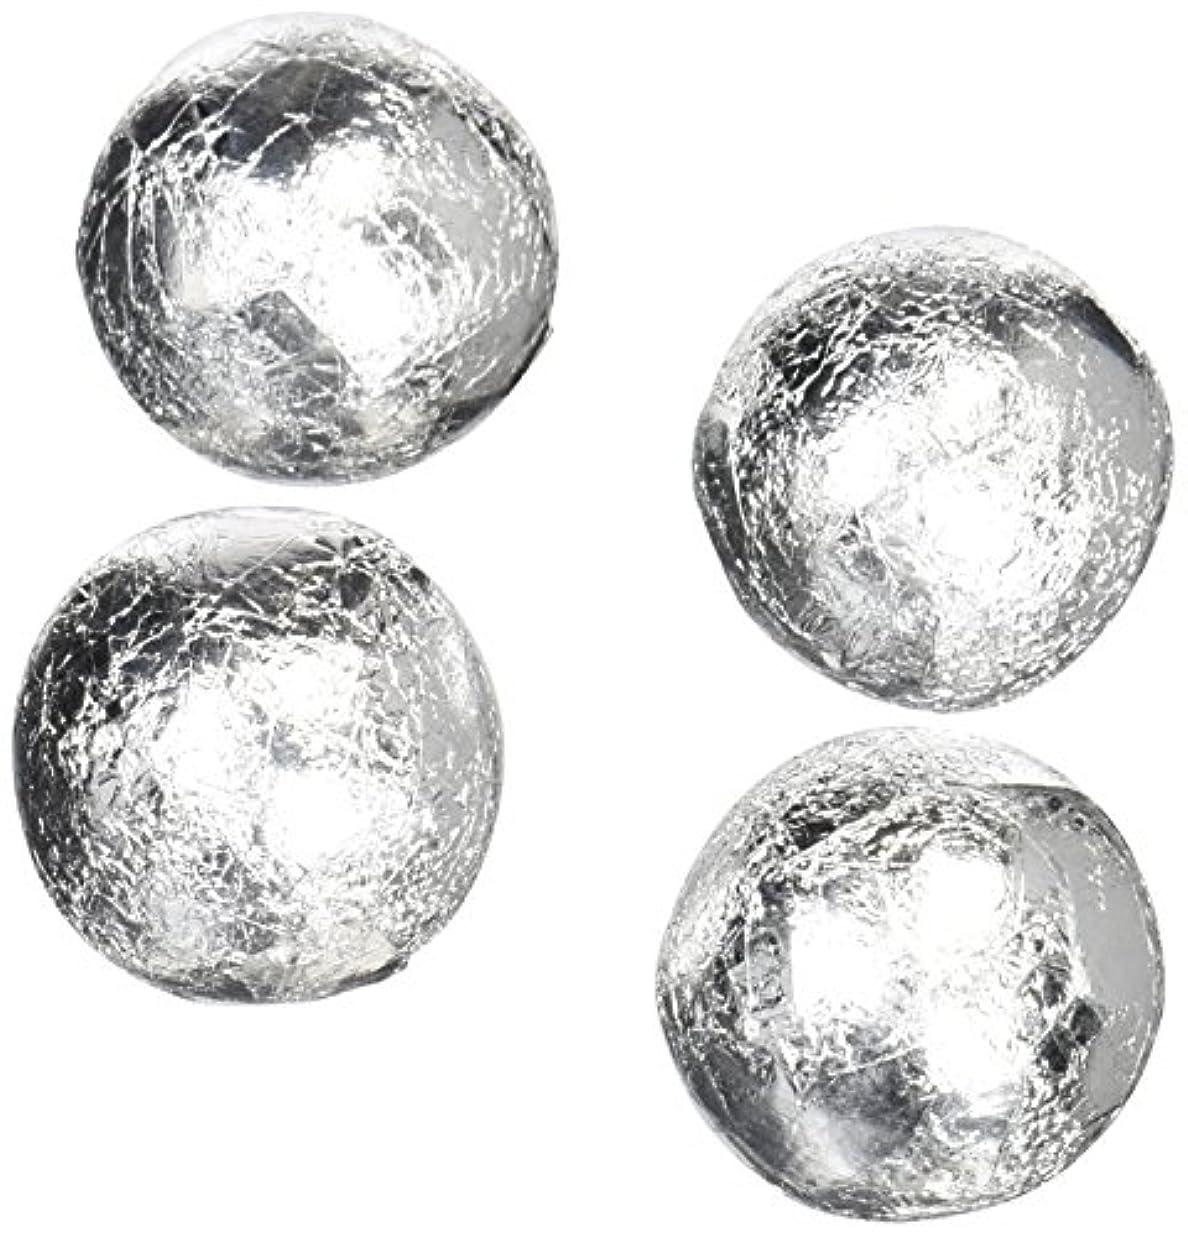 Lyraviviボール レギュラー4個入り